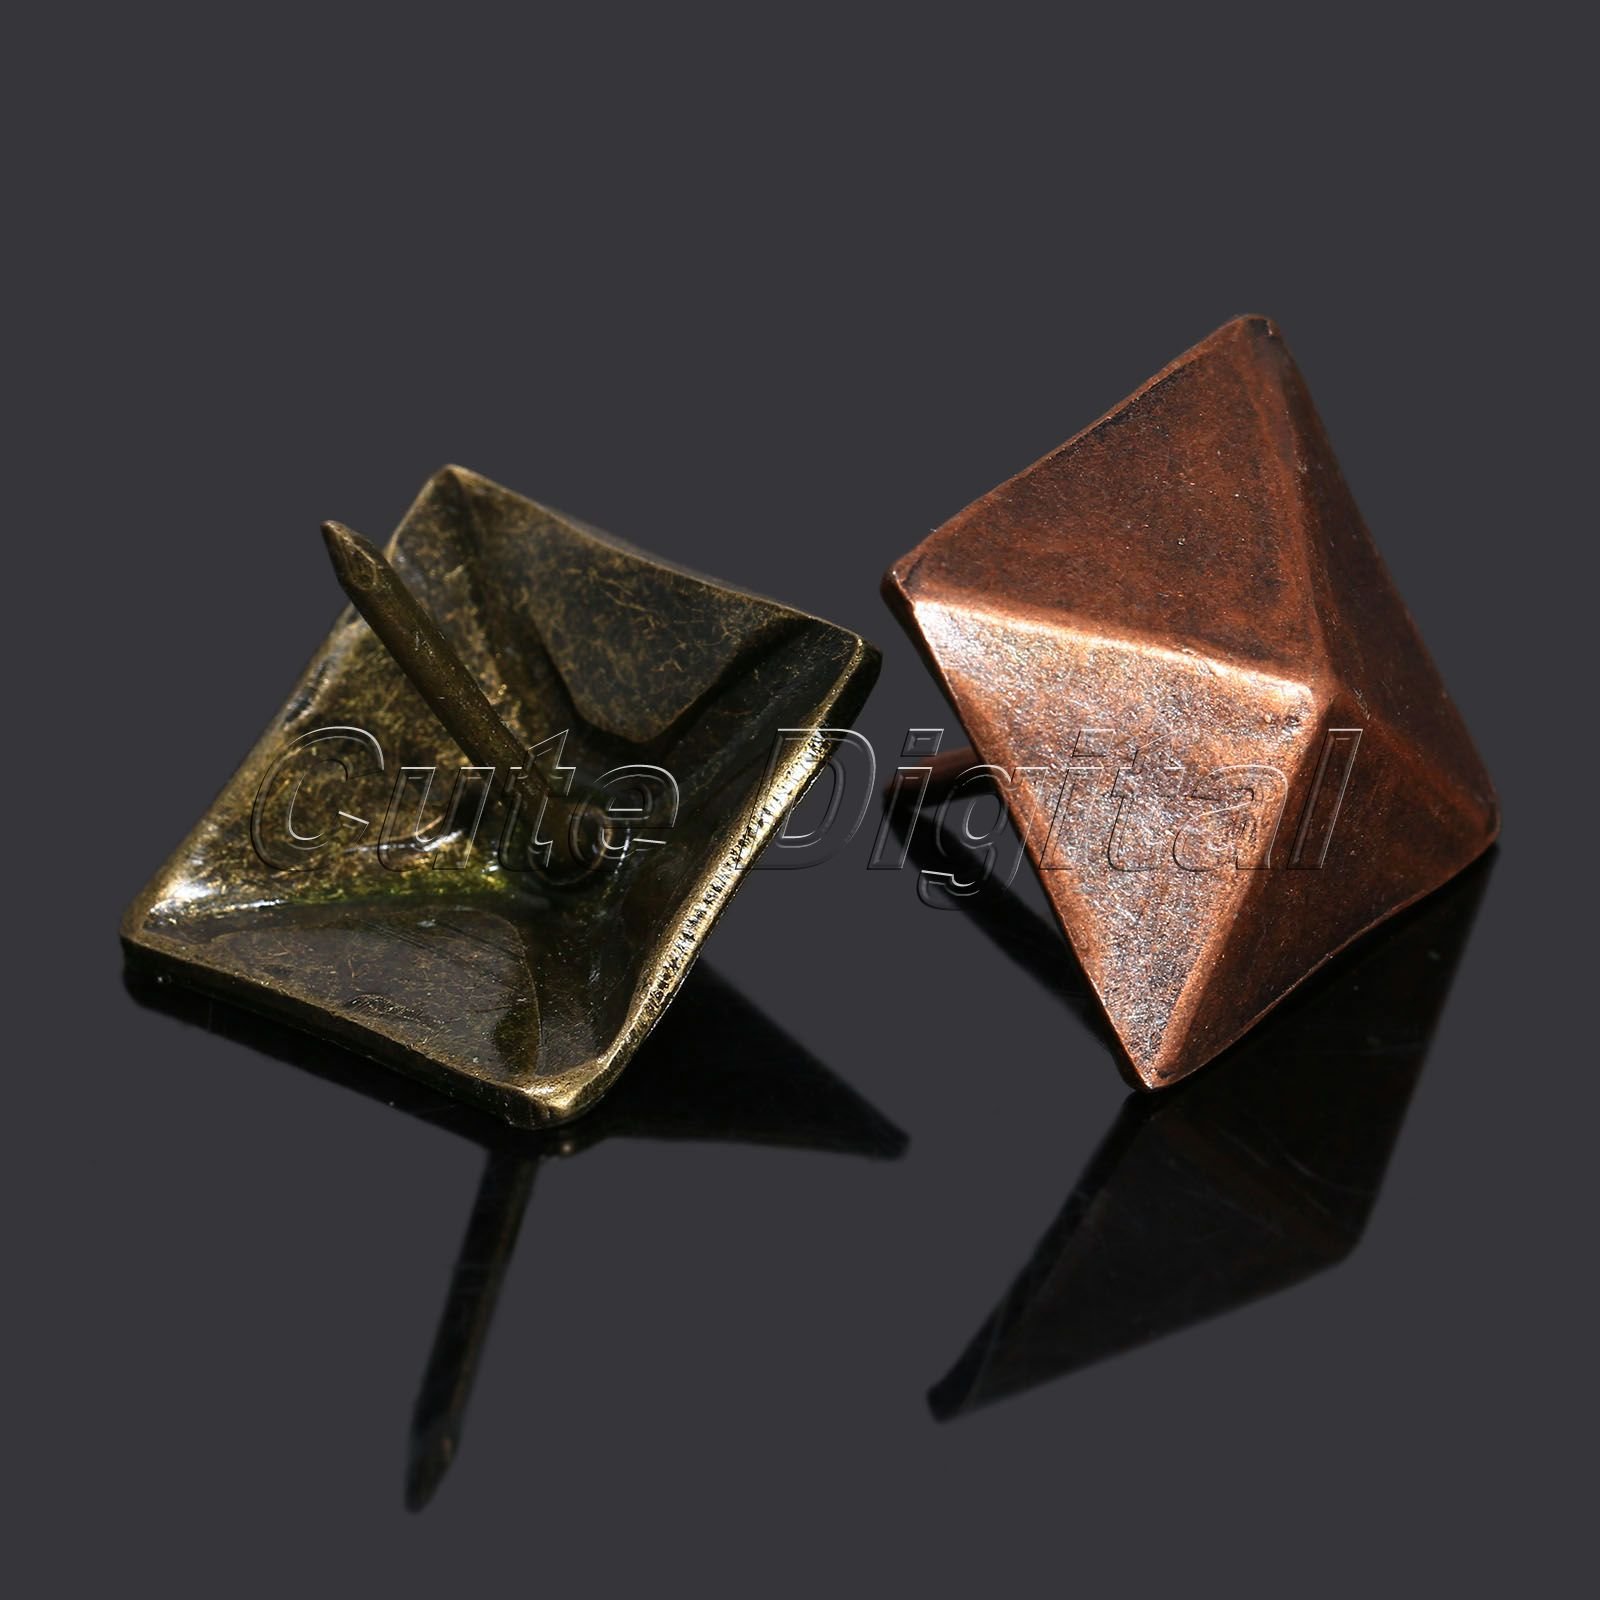 50pcs Decorative Tachas Upholstery Tacks Bronze Antique